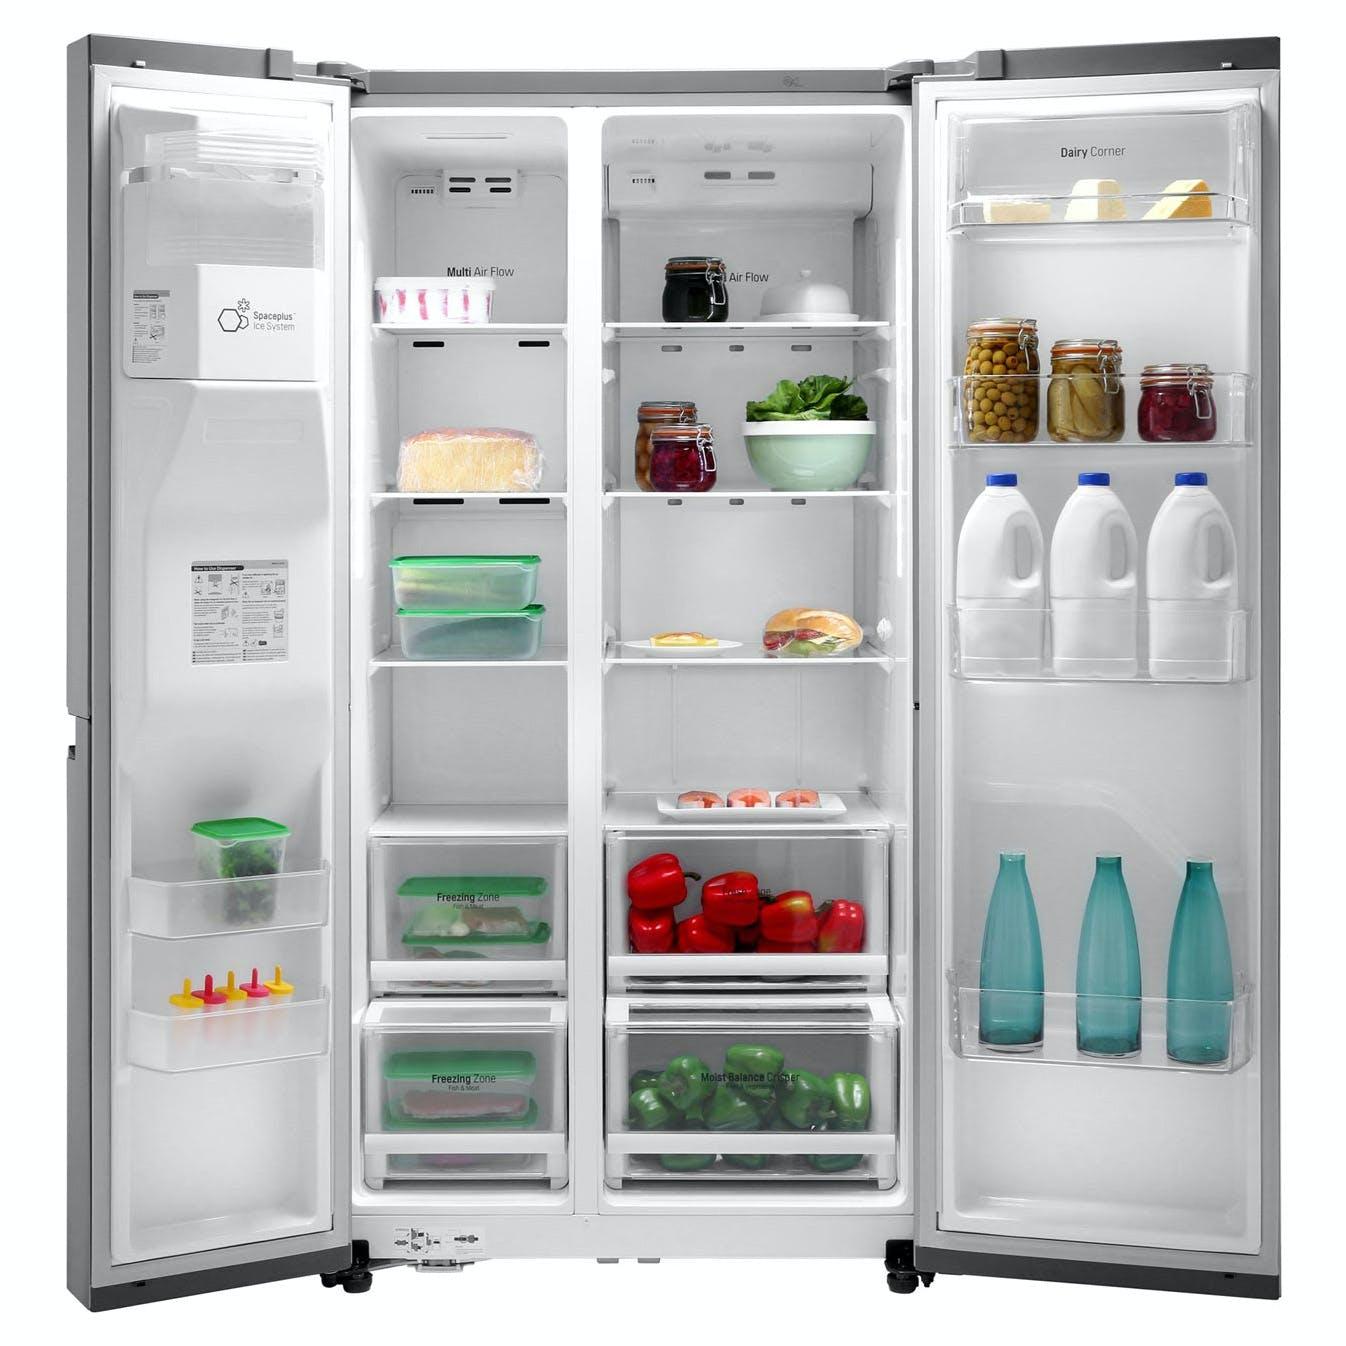 LG GSL760PZXV American Fridge Freezer in Shiny Steel, Ice/Water PL